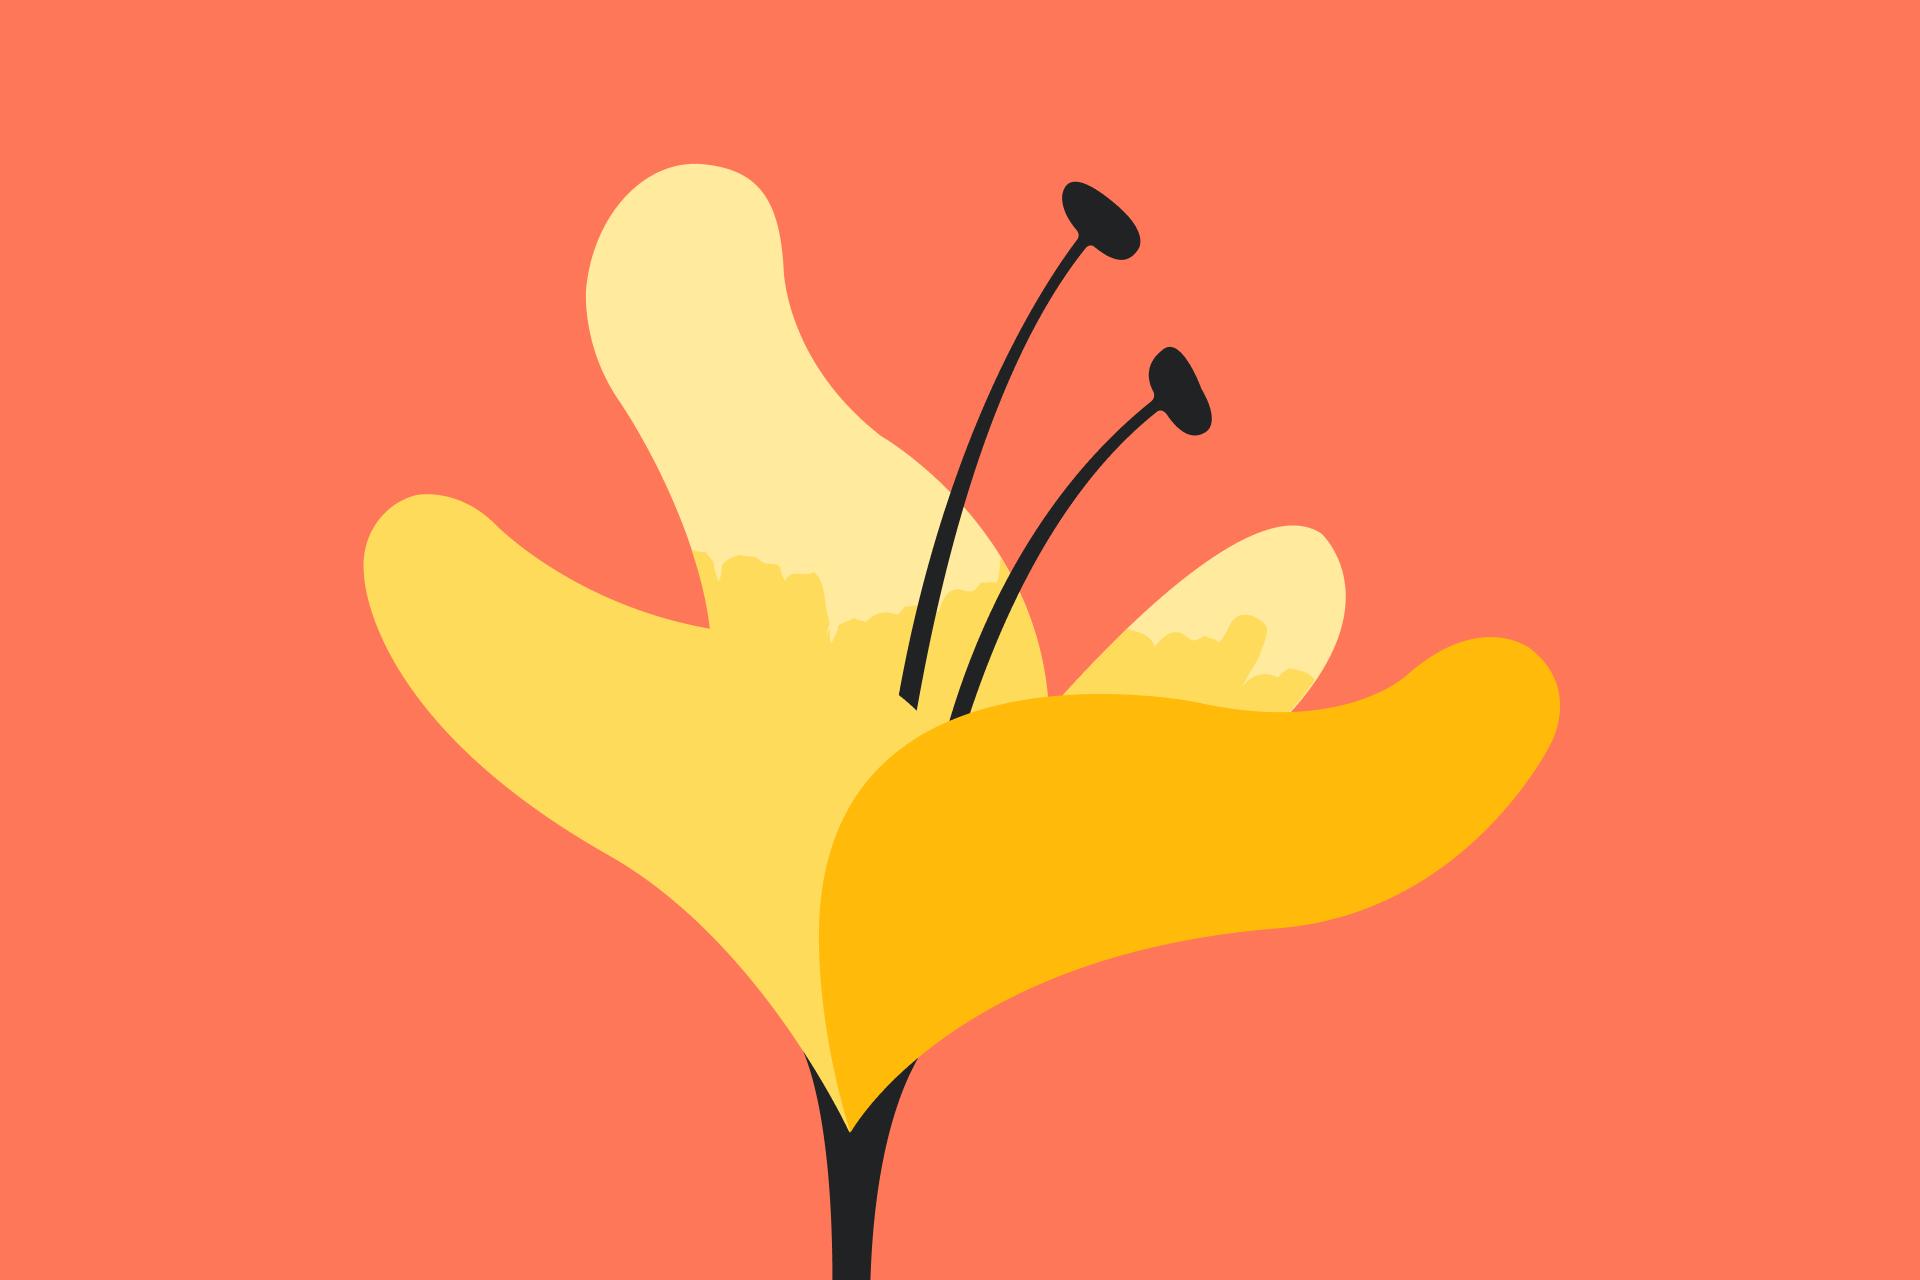 SE_fallcleaning_Flower-orange_3x2.png